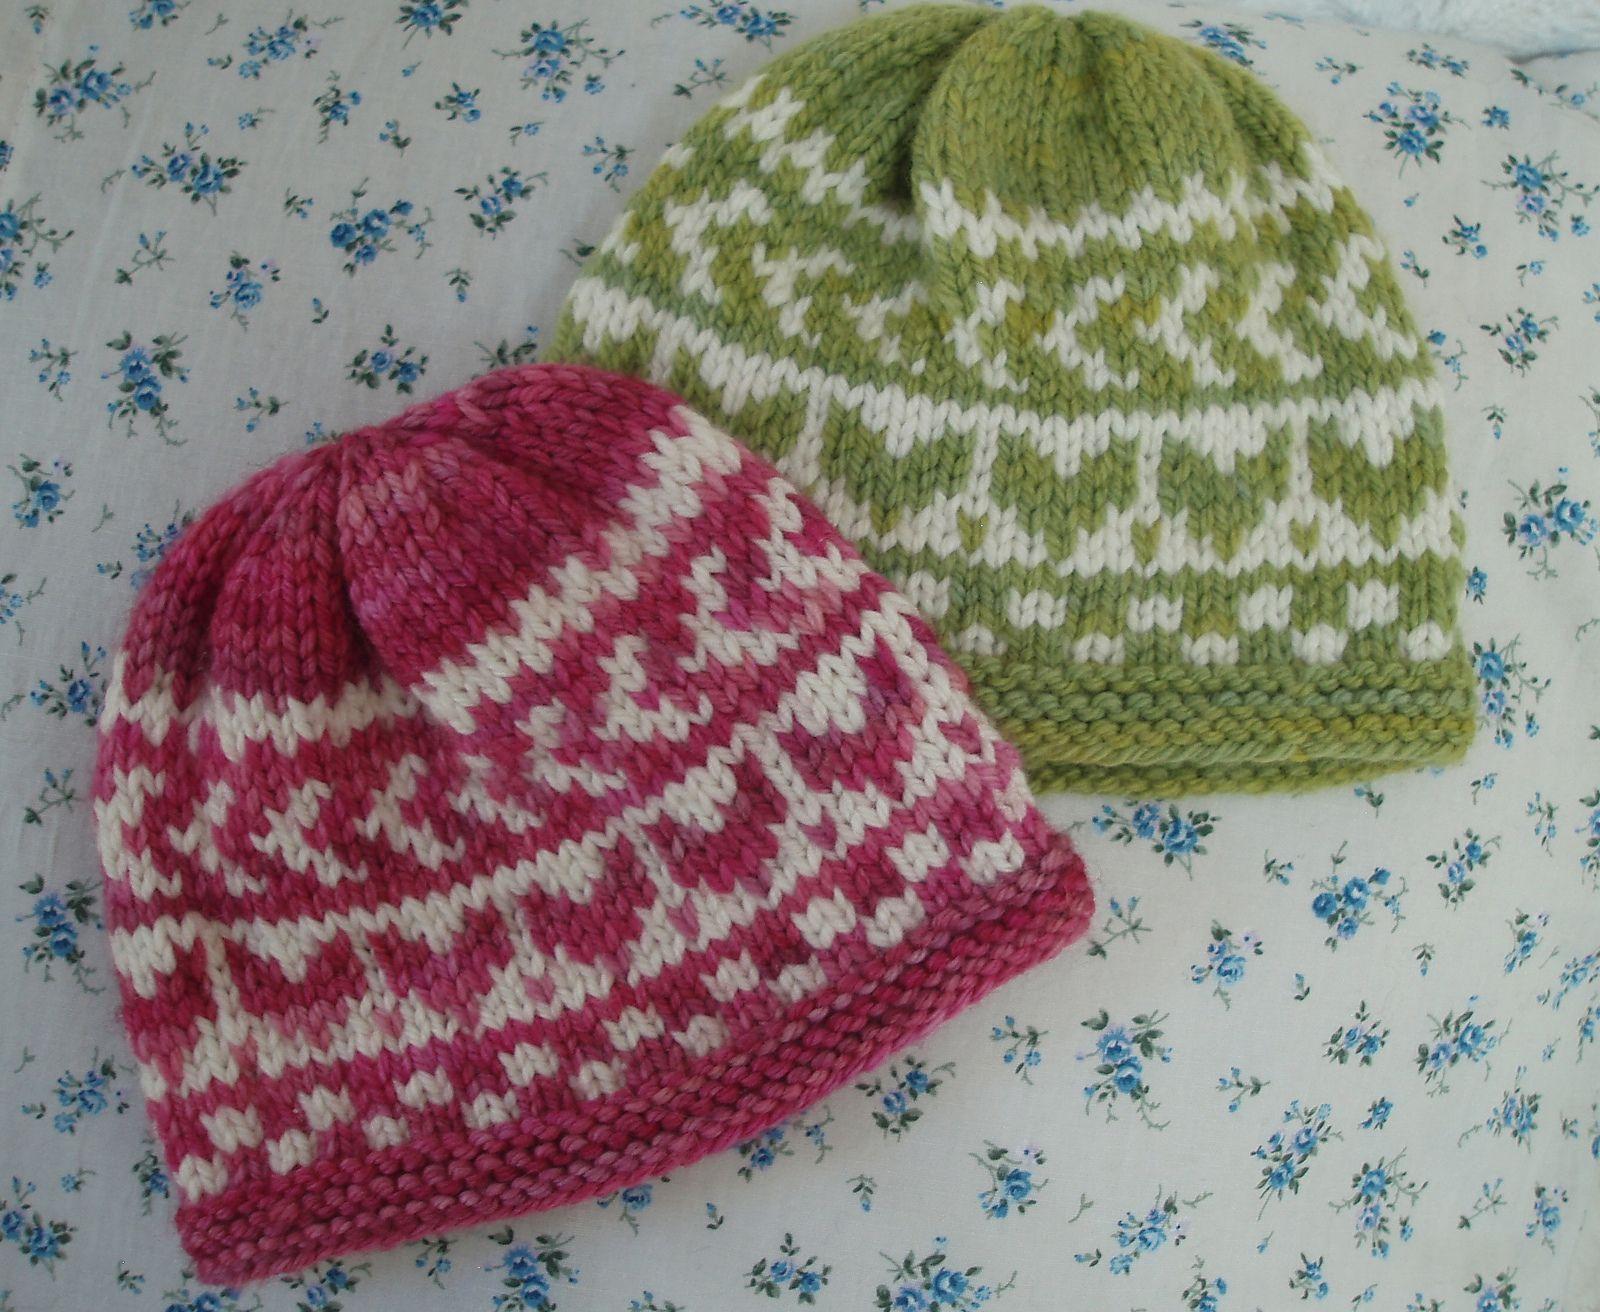 February Baby Fair Isle Hat pattern by Chiaki Hayashi | February ...